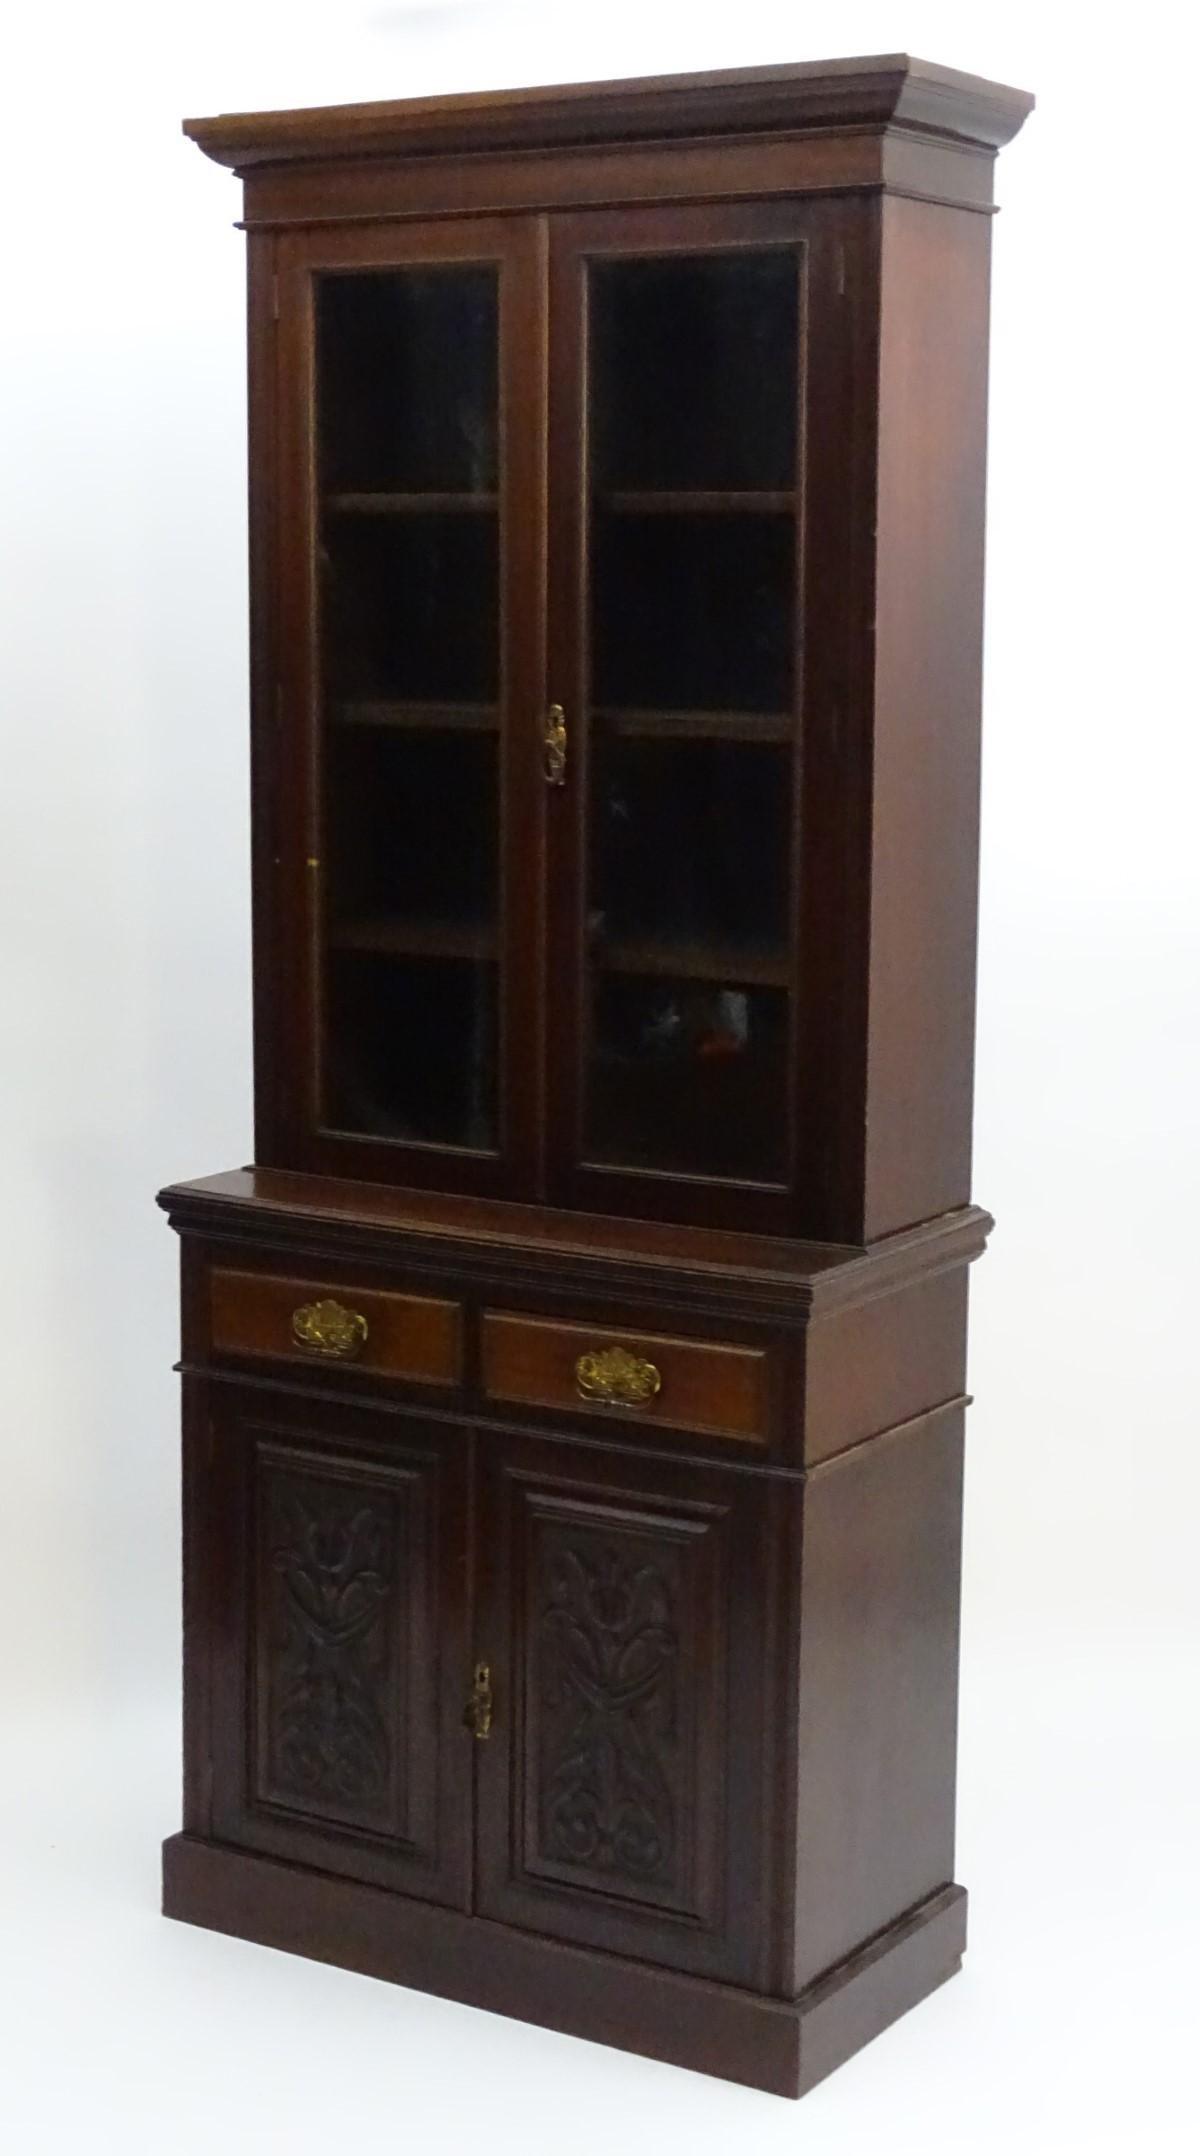 An Edwardian mahogany glazed bookcase, having a moulded